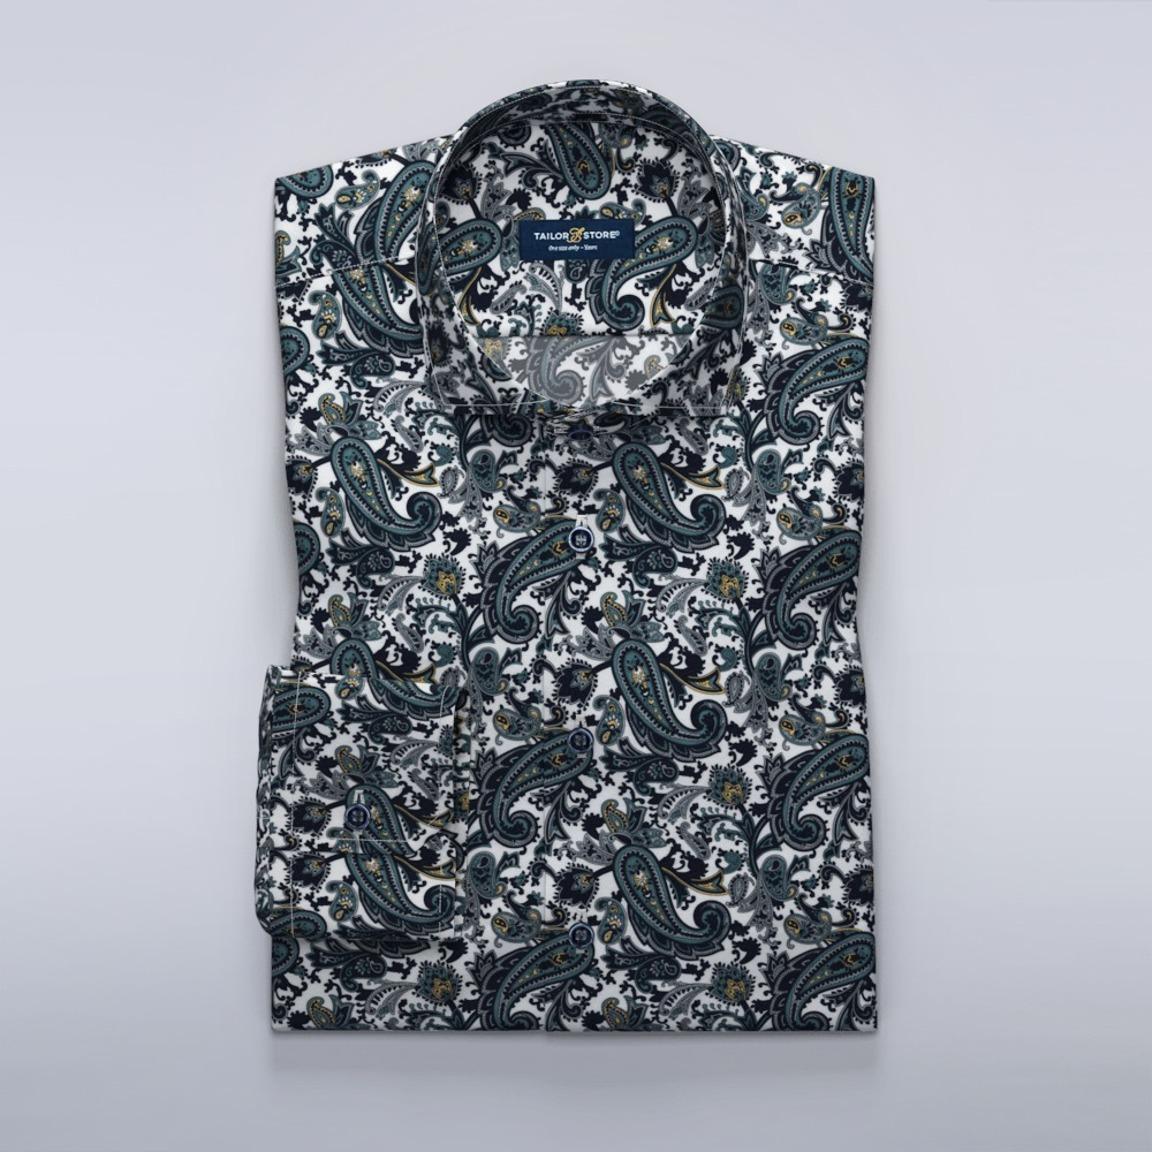 Dunkelblaues Hemd aus Twill mit Paisley-Muster